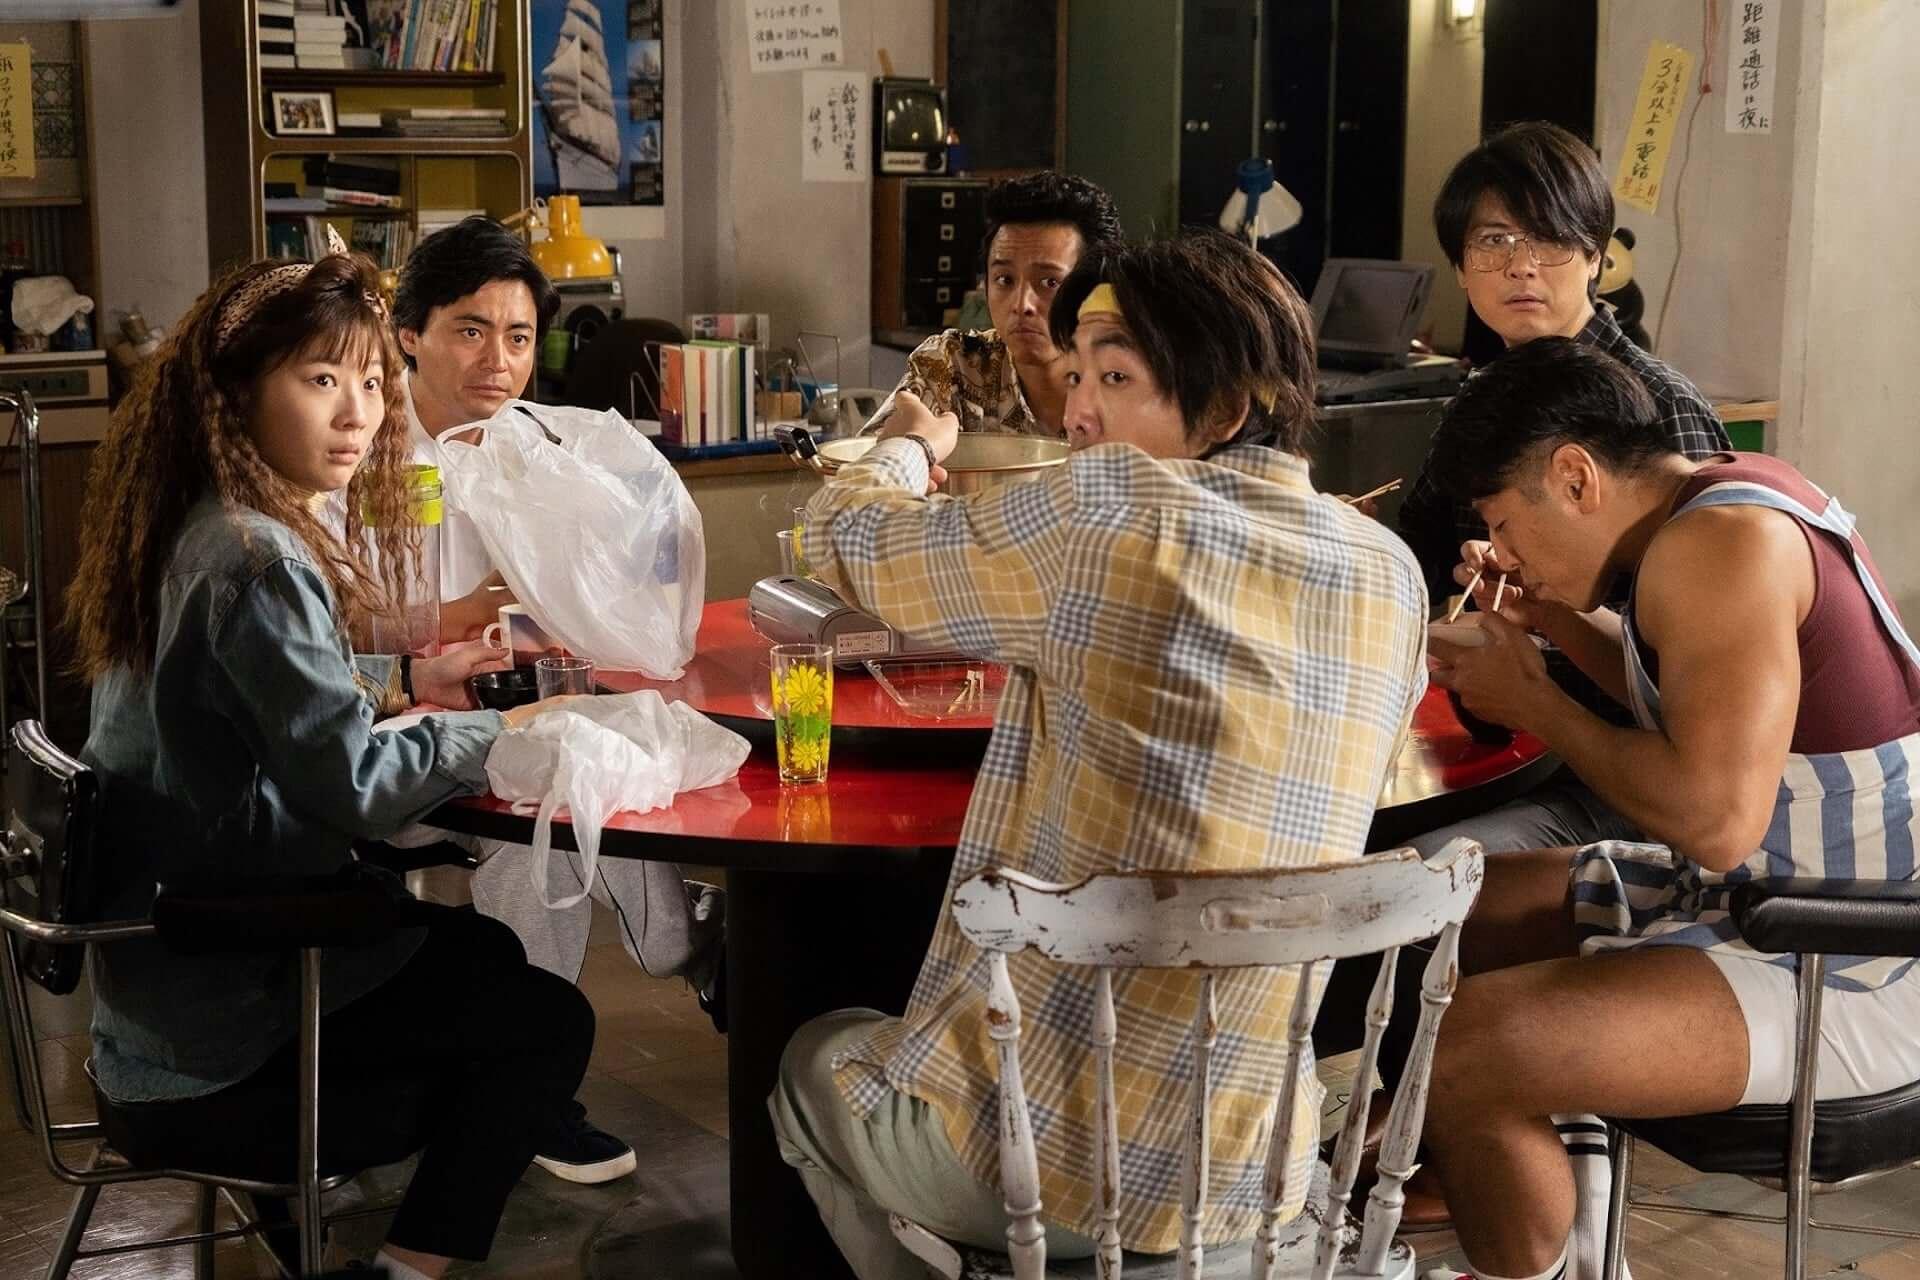 Netflix『全裸監督』本編映像公開|山田孝之演じる村西「素材を生かすも殺すも料理人の腕次第だからな」 film190711zenrakantoku_1-1920x1280